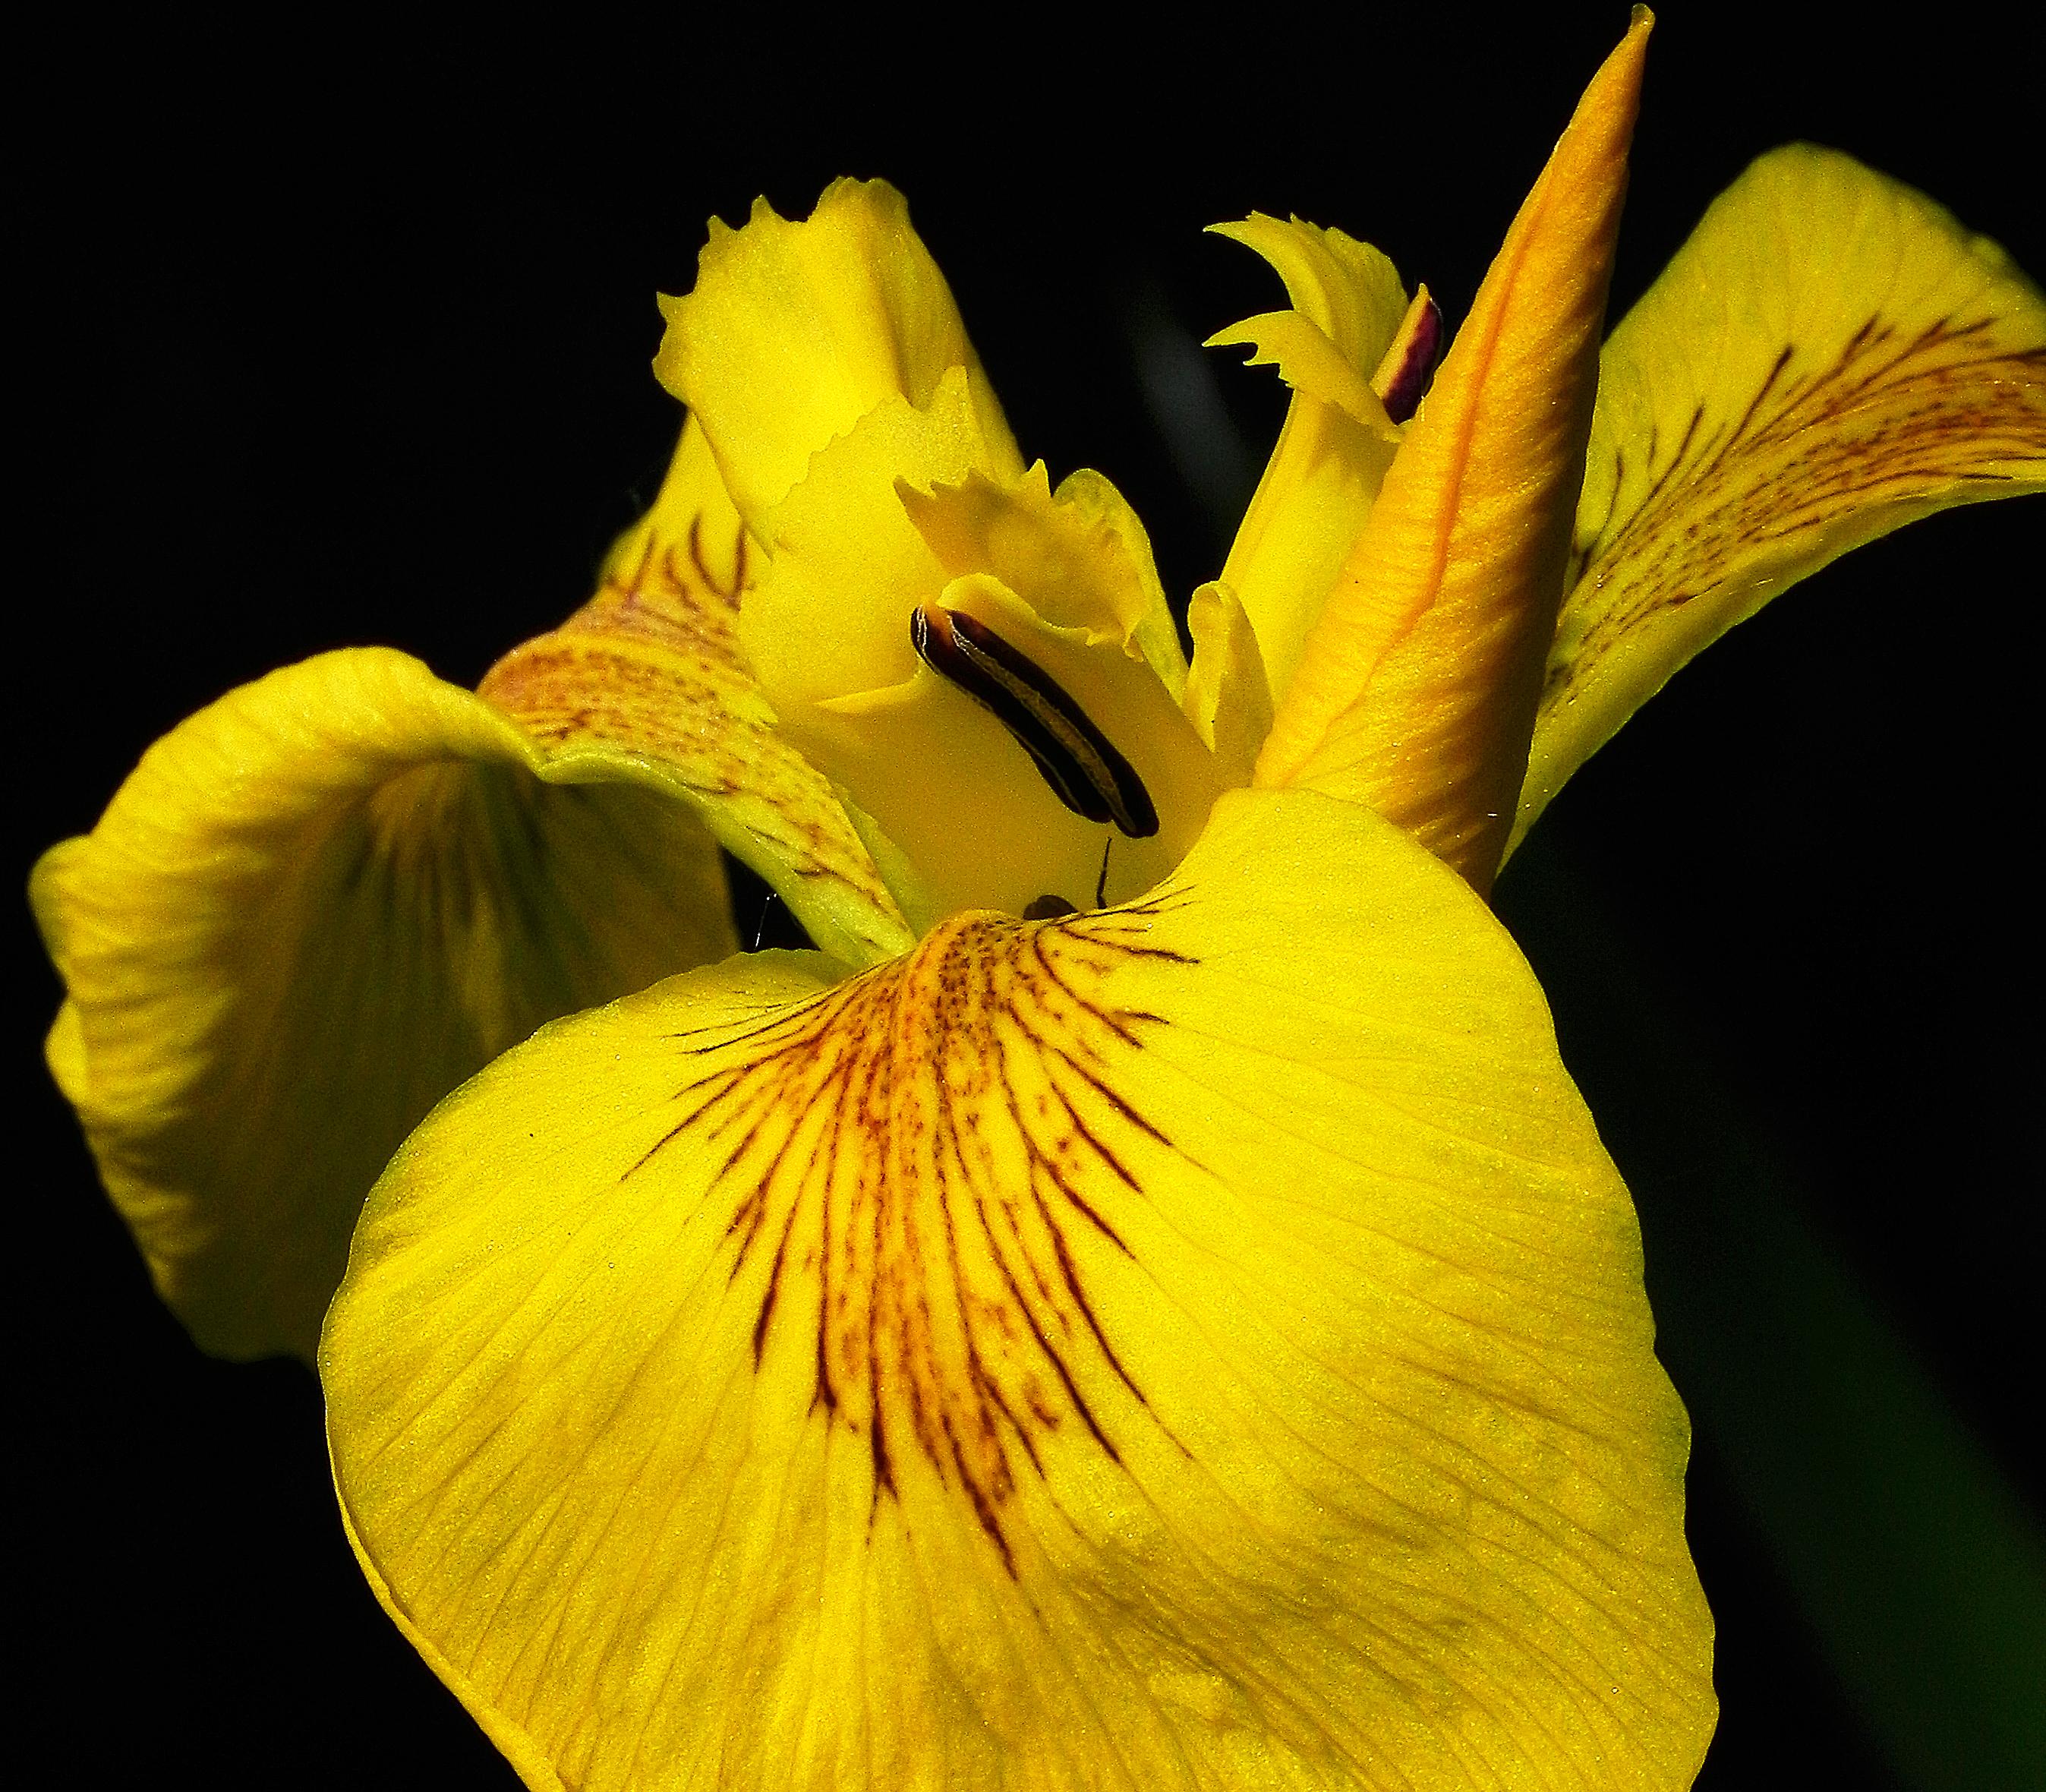 Fotos Gratis Hoja Flor Petalo Botanica Amarillo Flora Flores